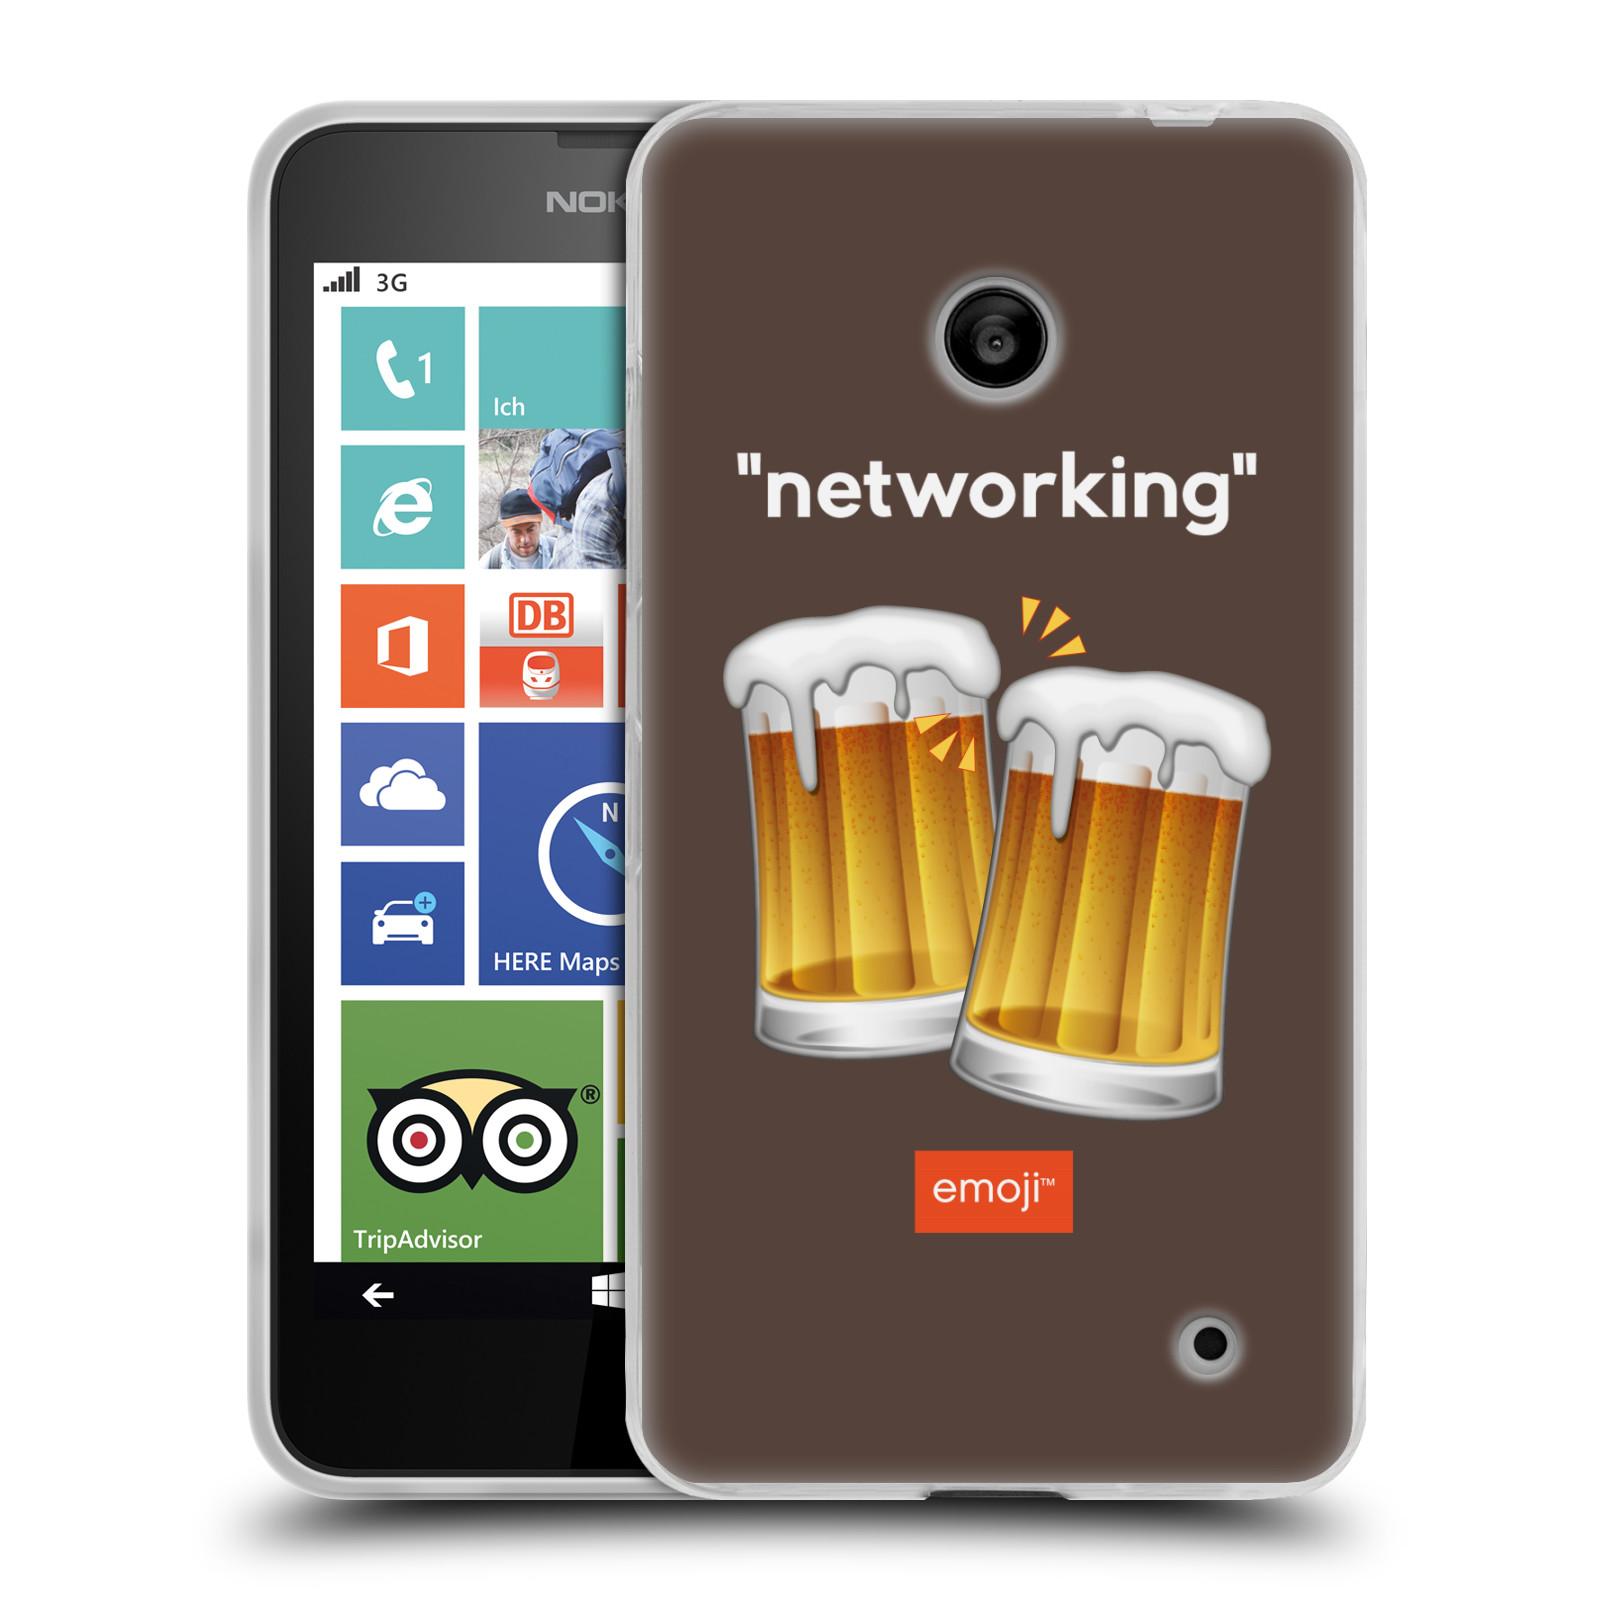 Silikonové pouzdro na mobil Nokia Lumia 635 HEAD CASE EMOJI - Pivní networking (Silikonový kryt či obal s oficiálním motivem EMOJI na mobilní telefon Nokia Lumia 635 Dual SIM)